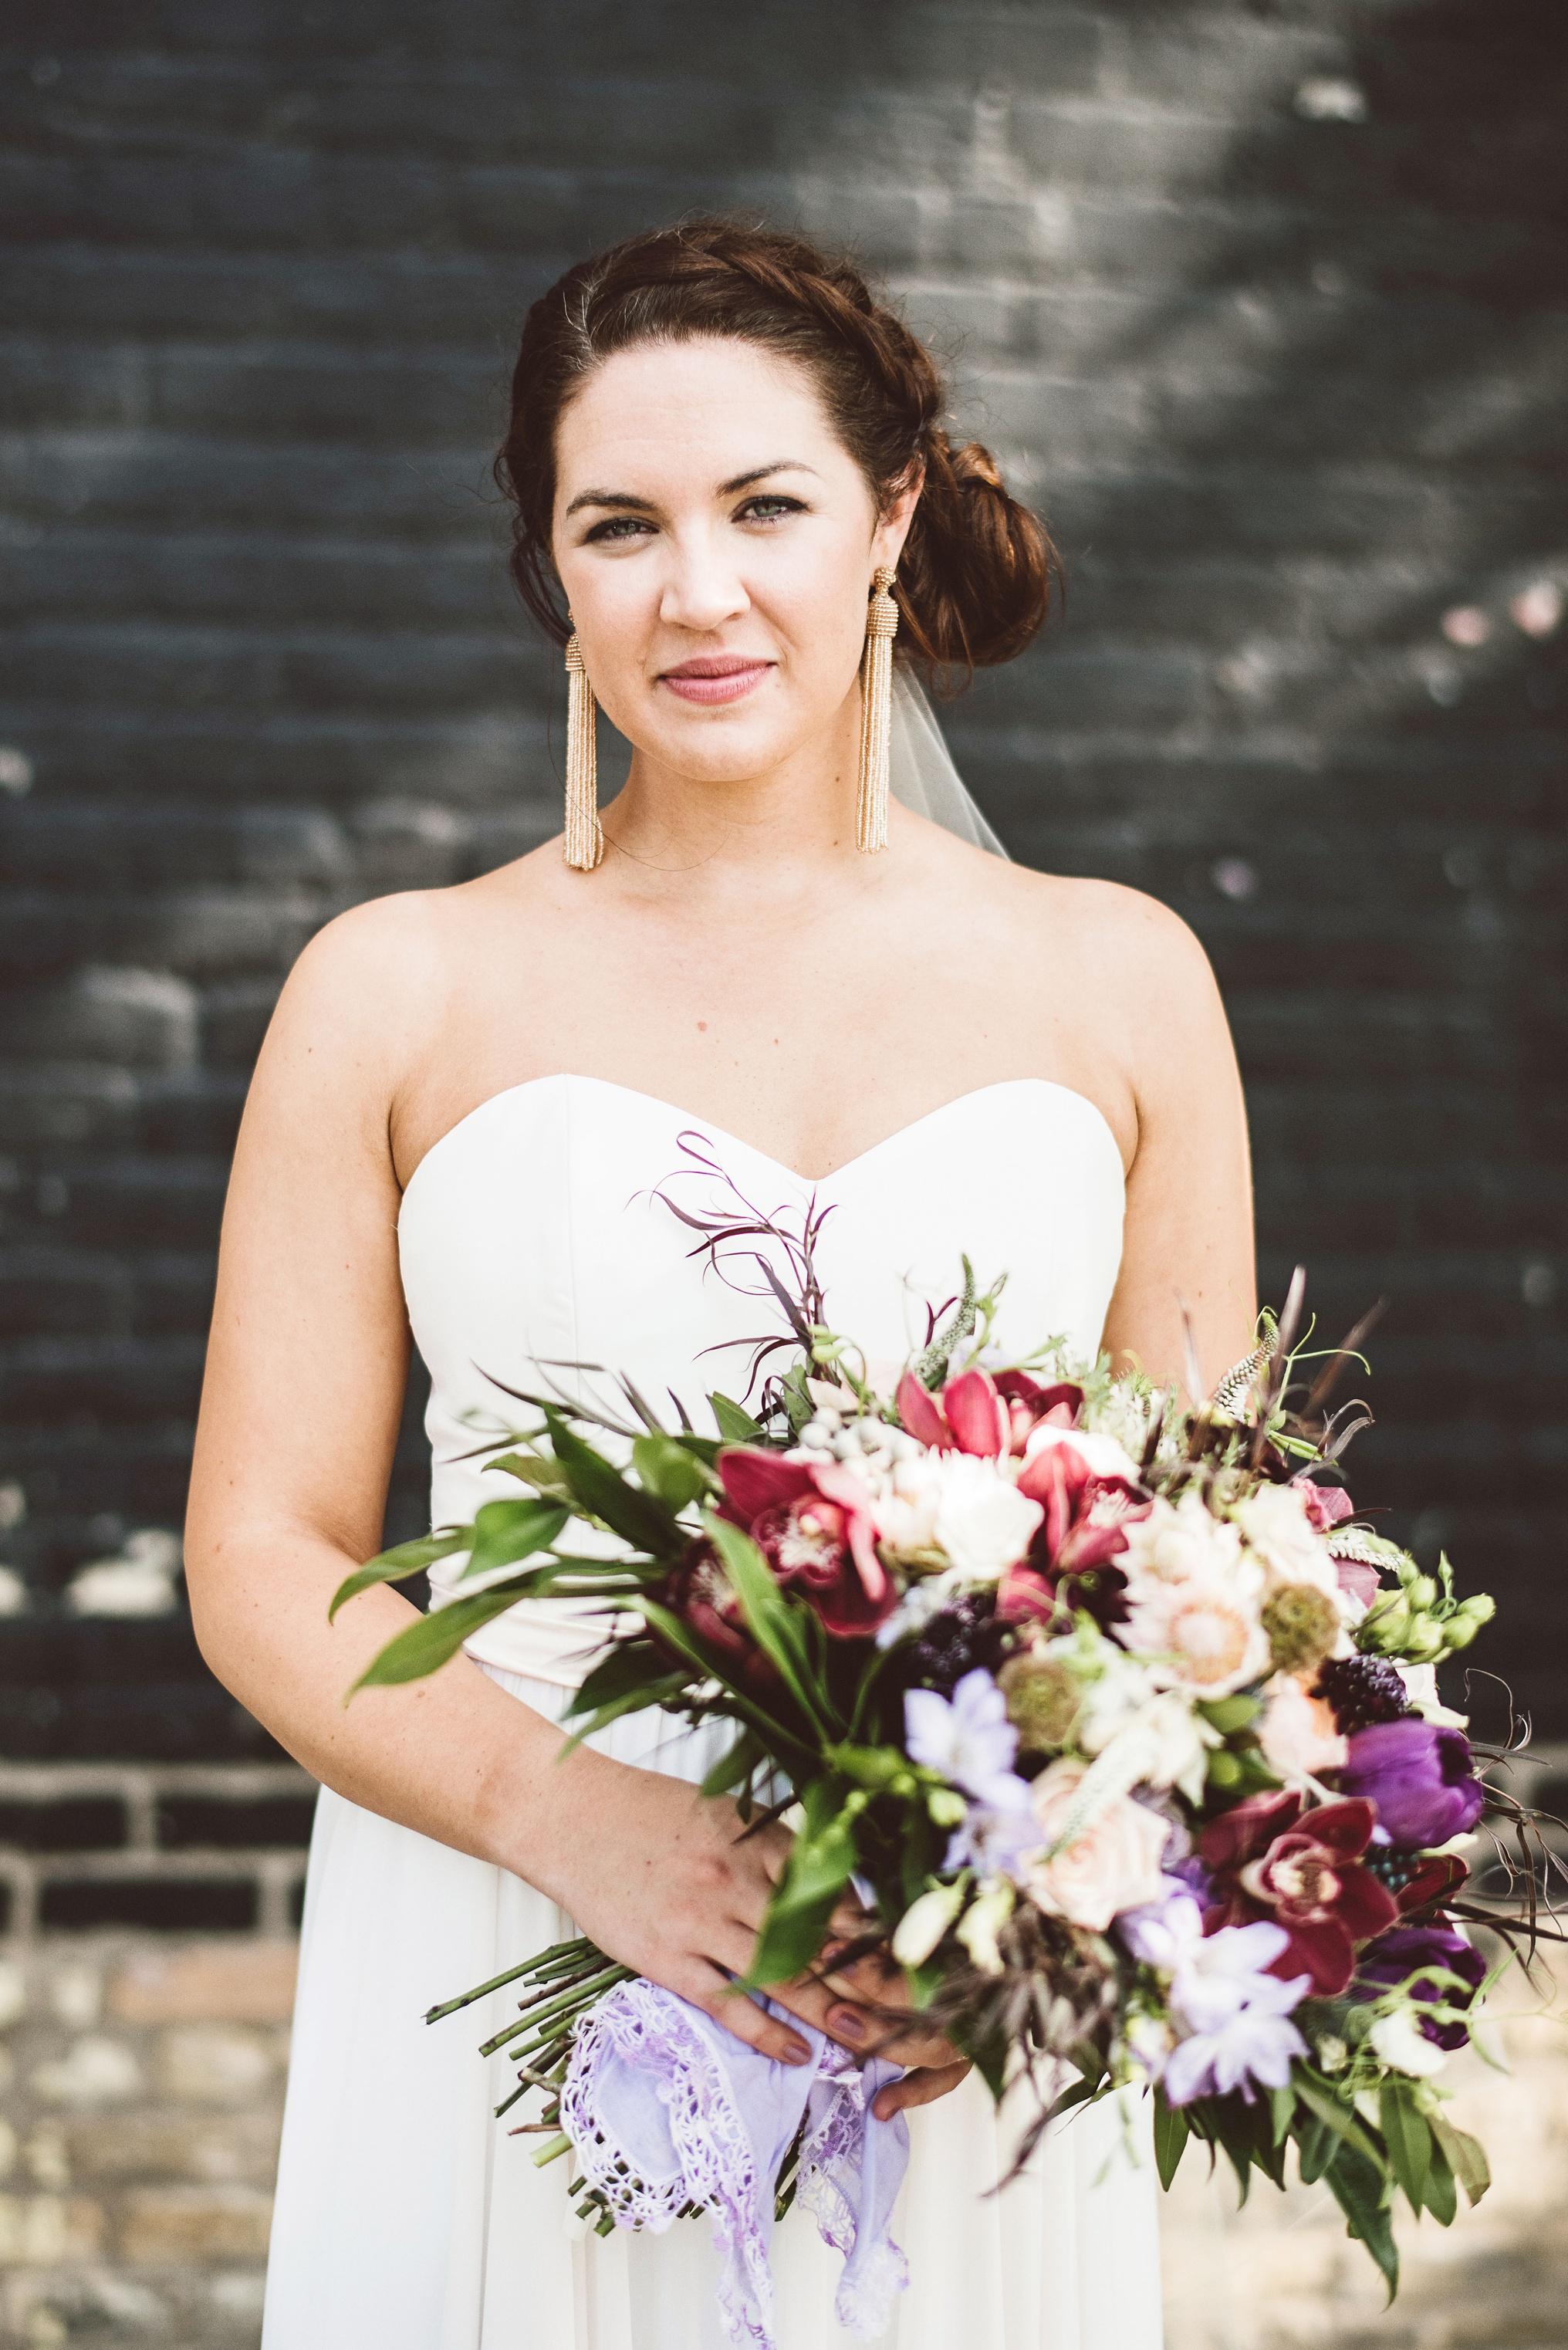 best_wedding_photography_2017_by_lucas_botz_photography_227.jpg